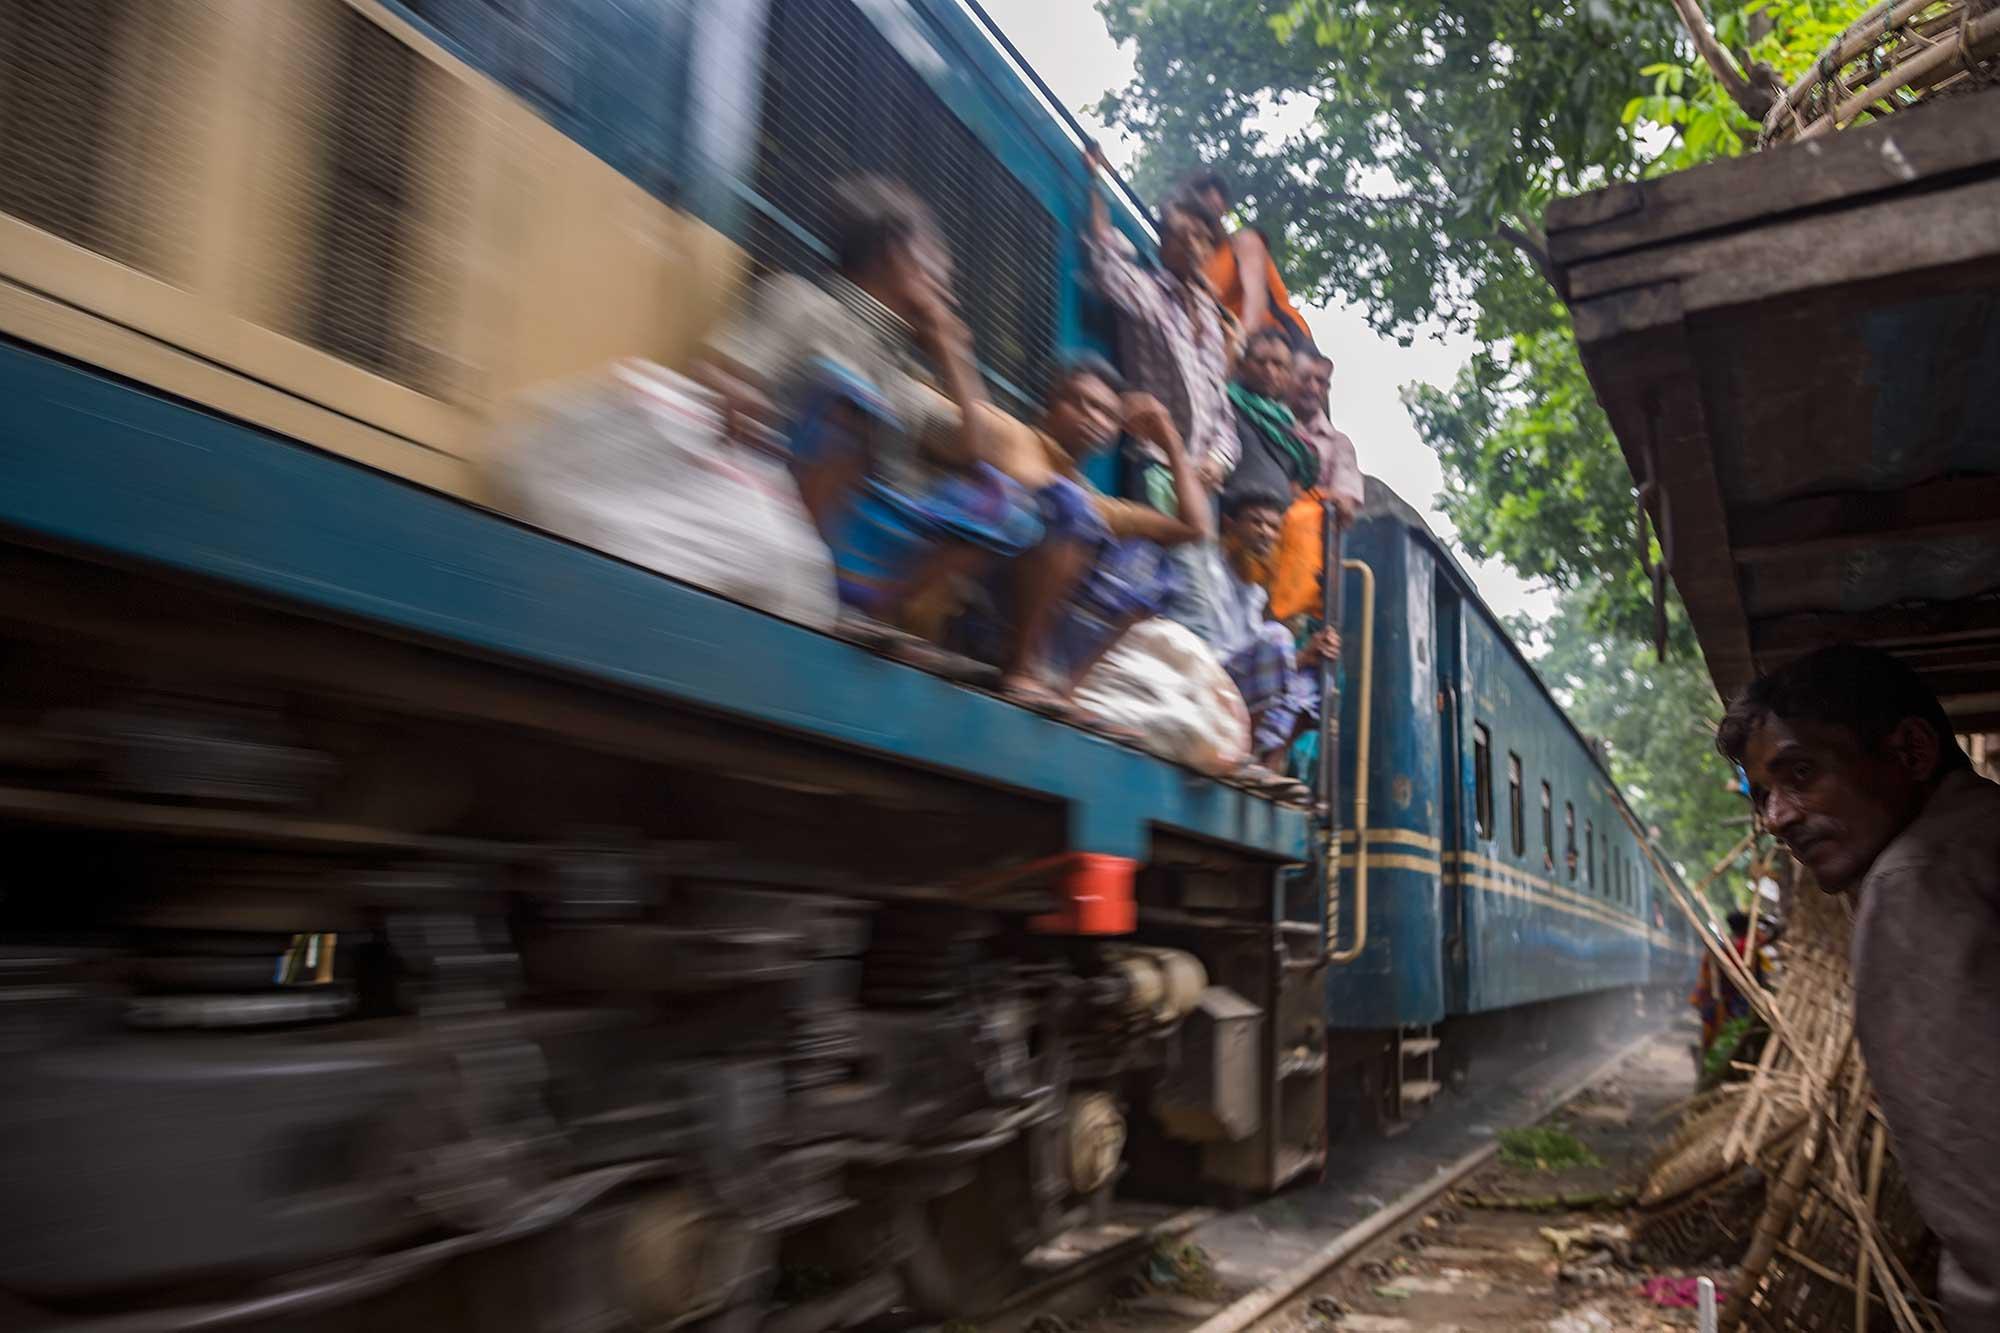 Train passing through Dhaka's shanty town area, Bangladesh. © Ulli Maier & Nisa Maier